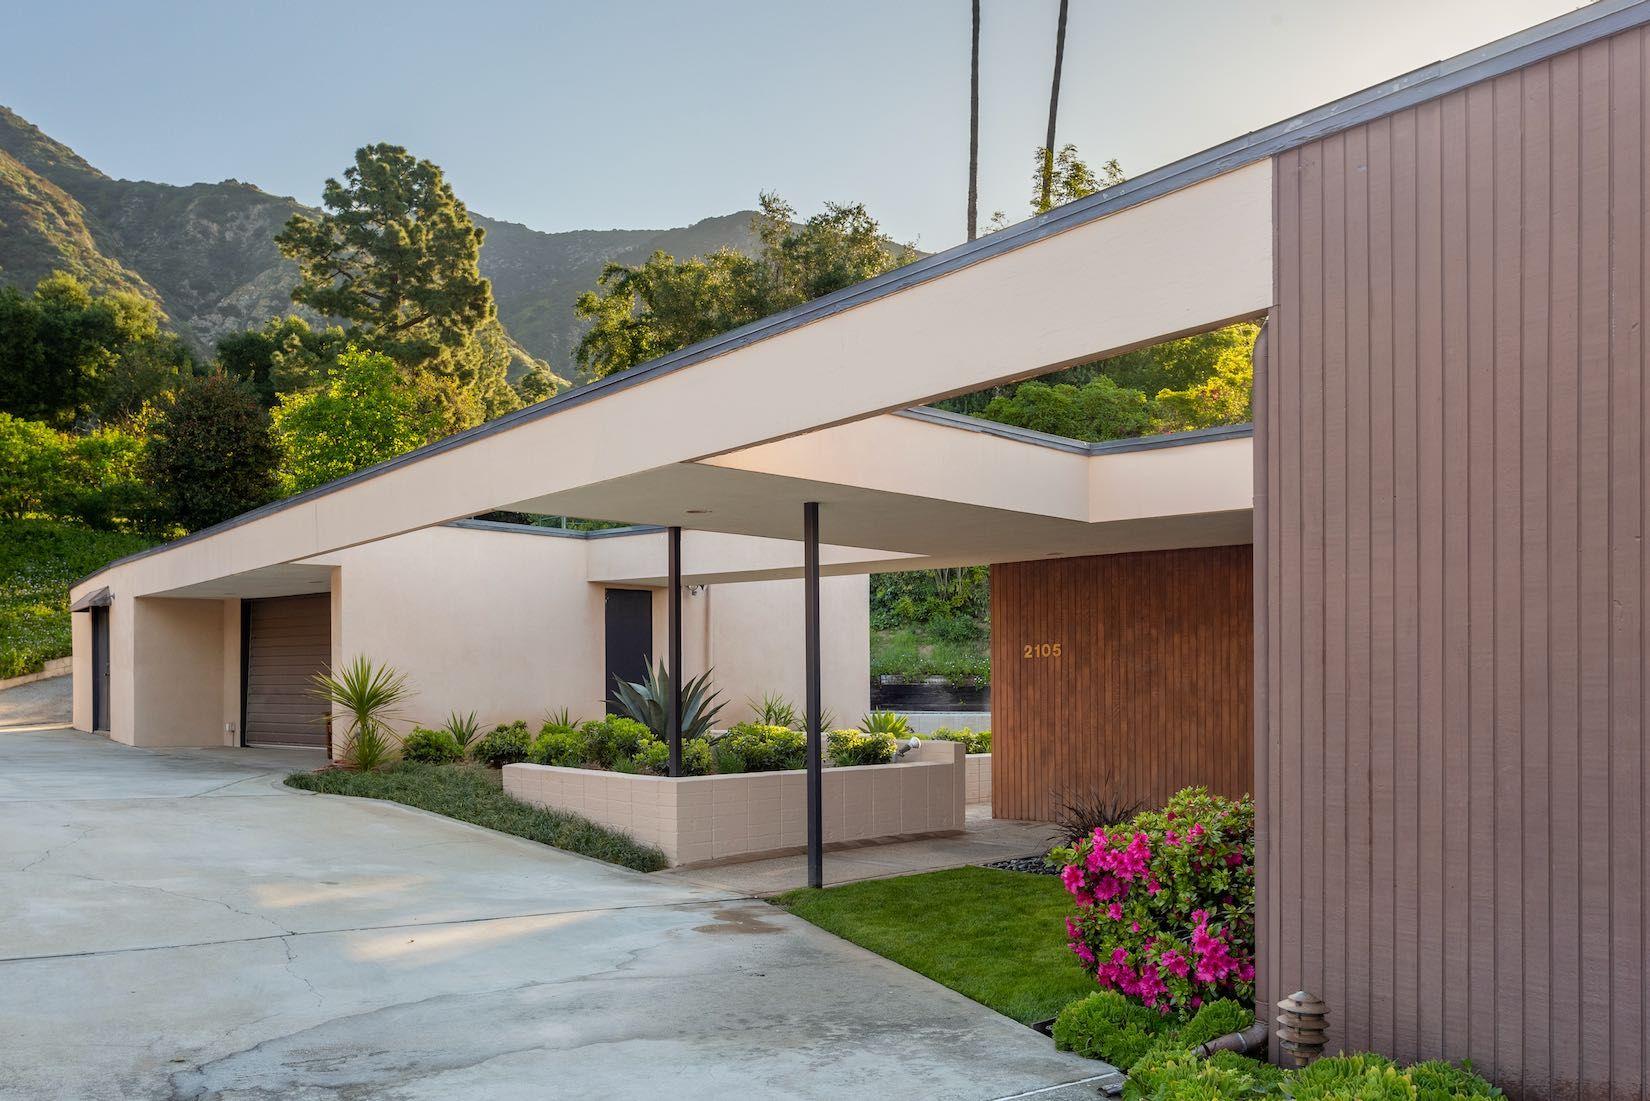 A midcentury home by John F Galbraith in Pasadena, US